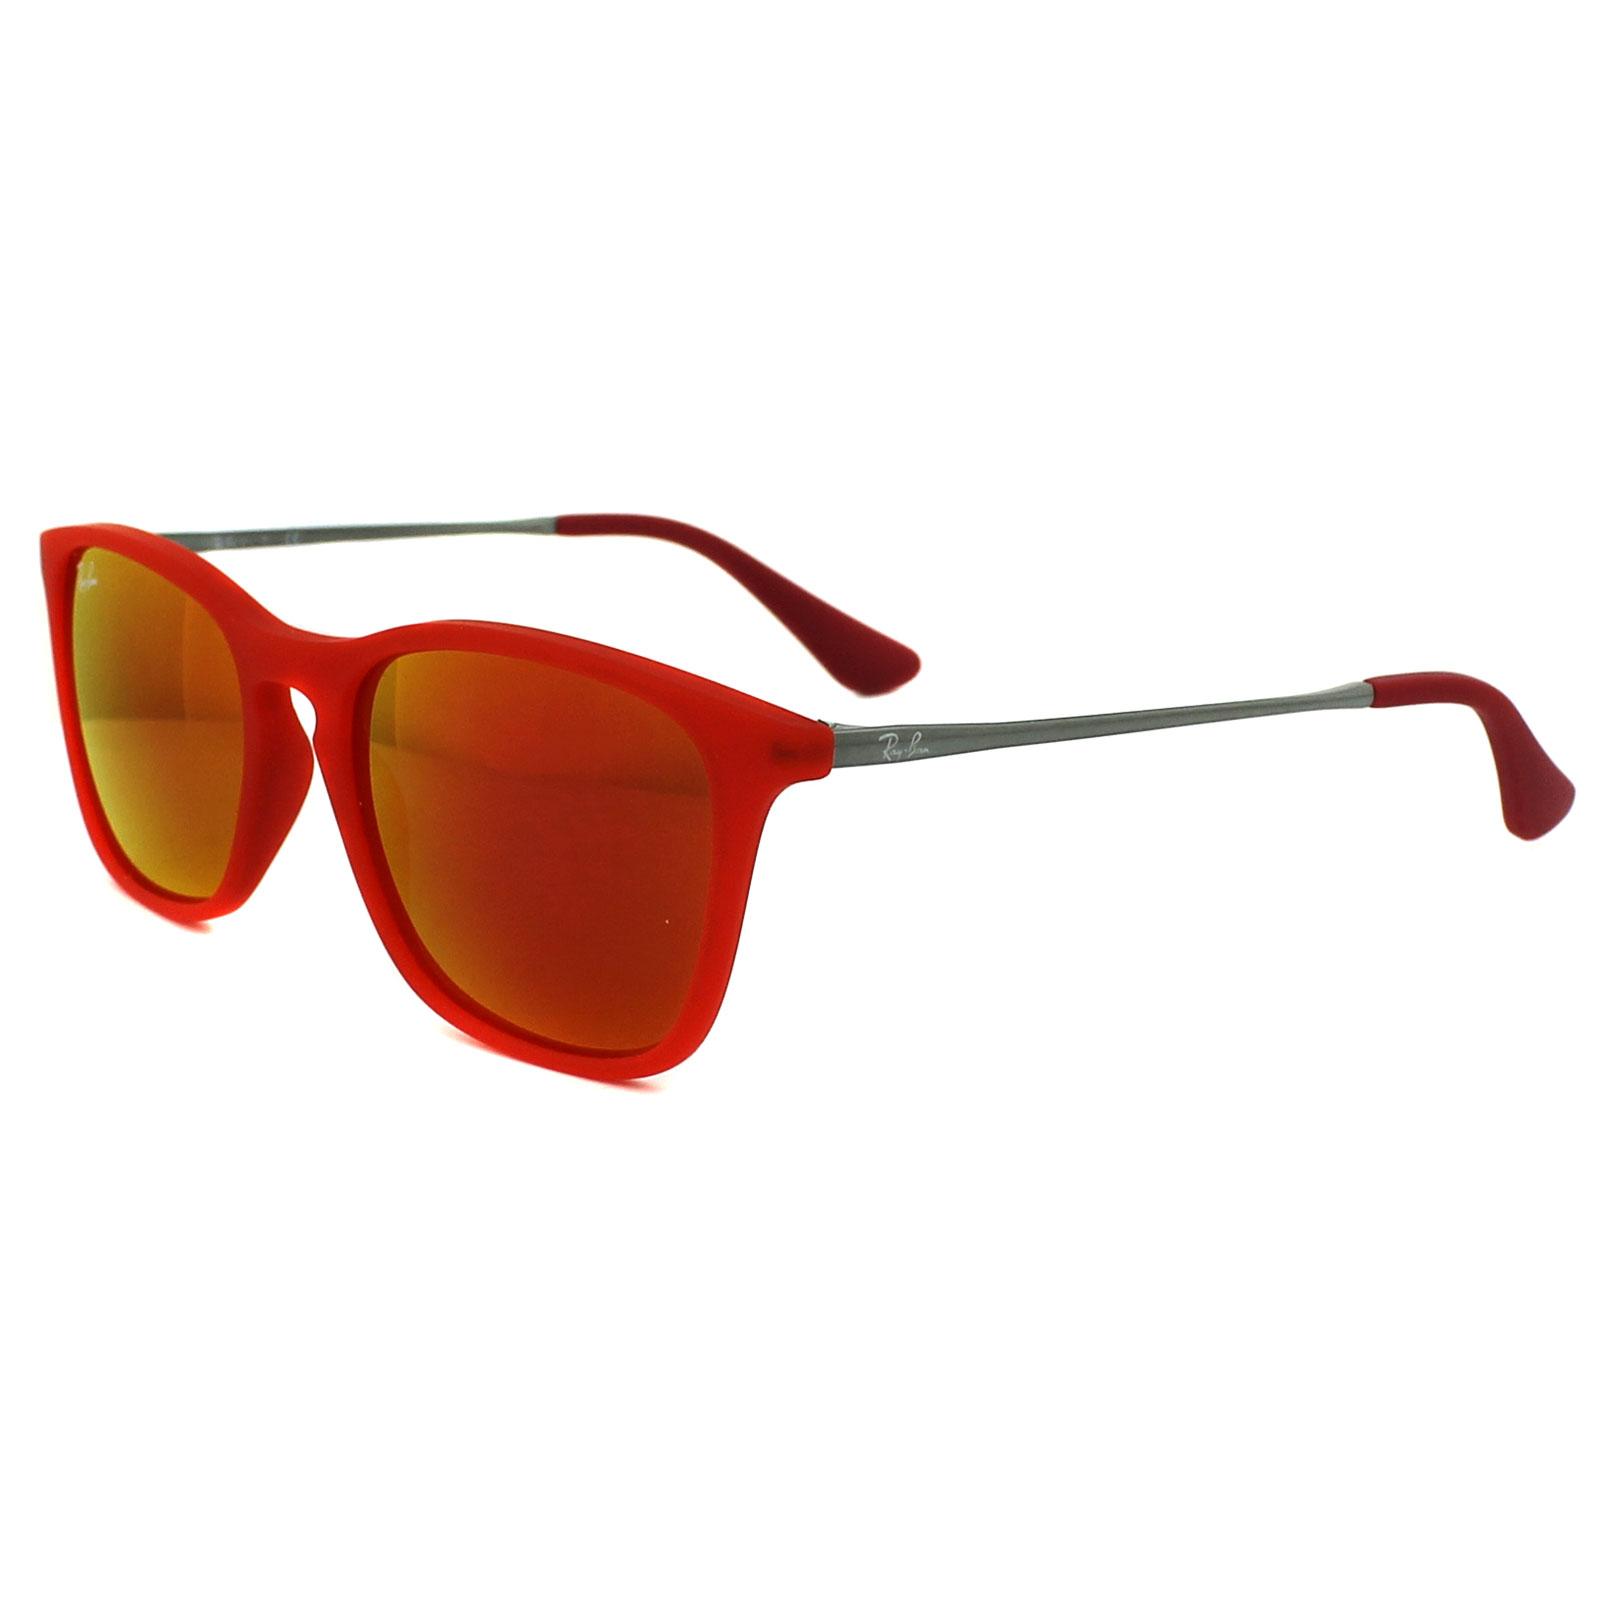 Ray-Ban Junior 9061 Sunglasses